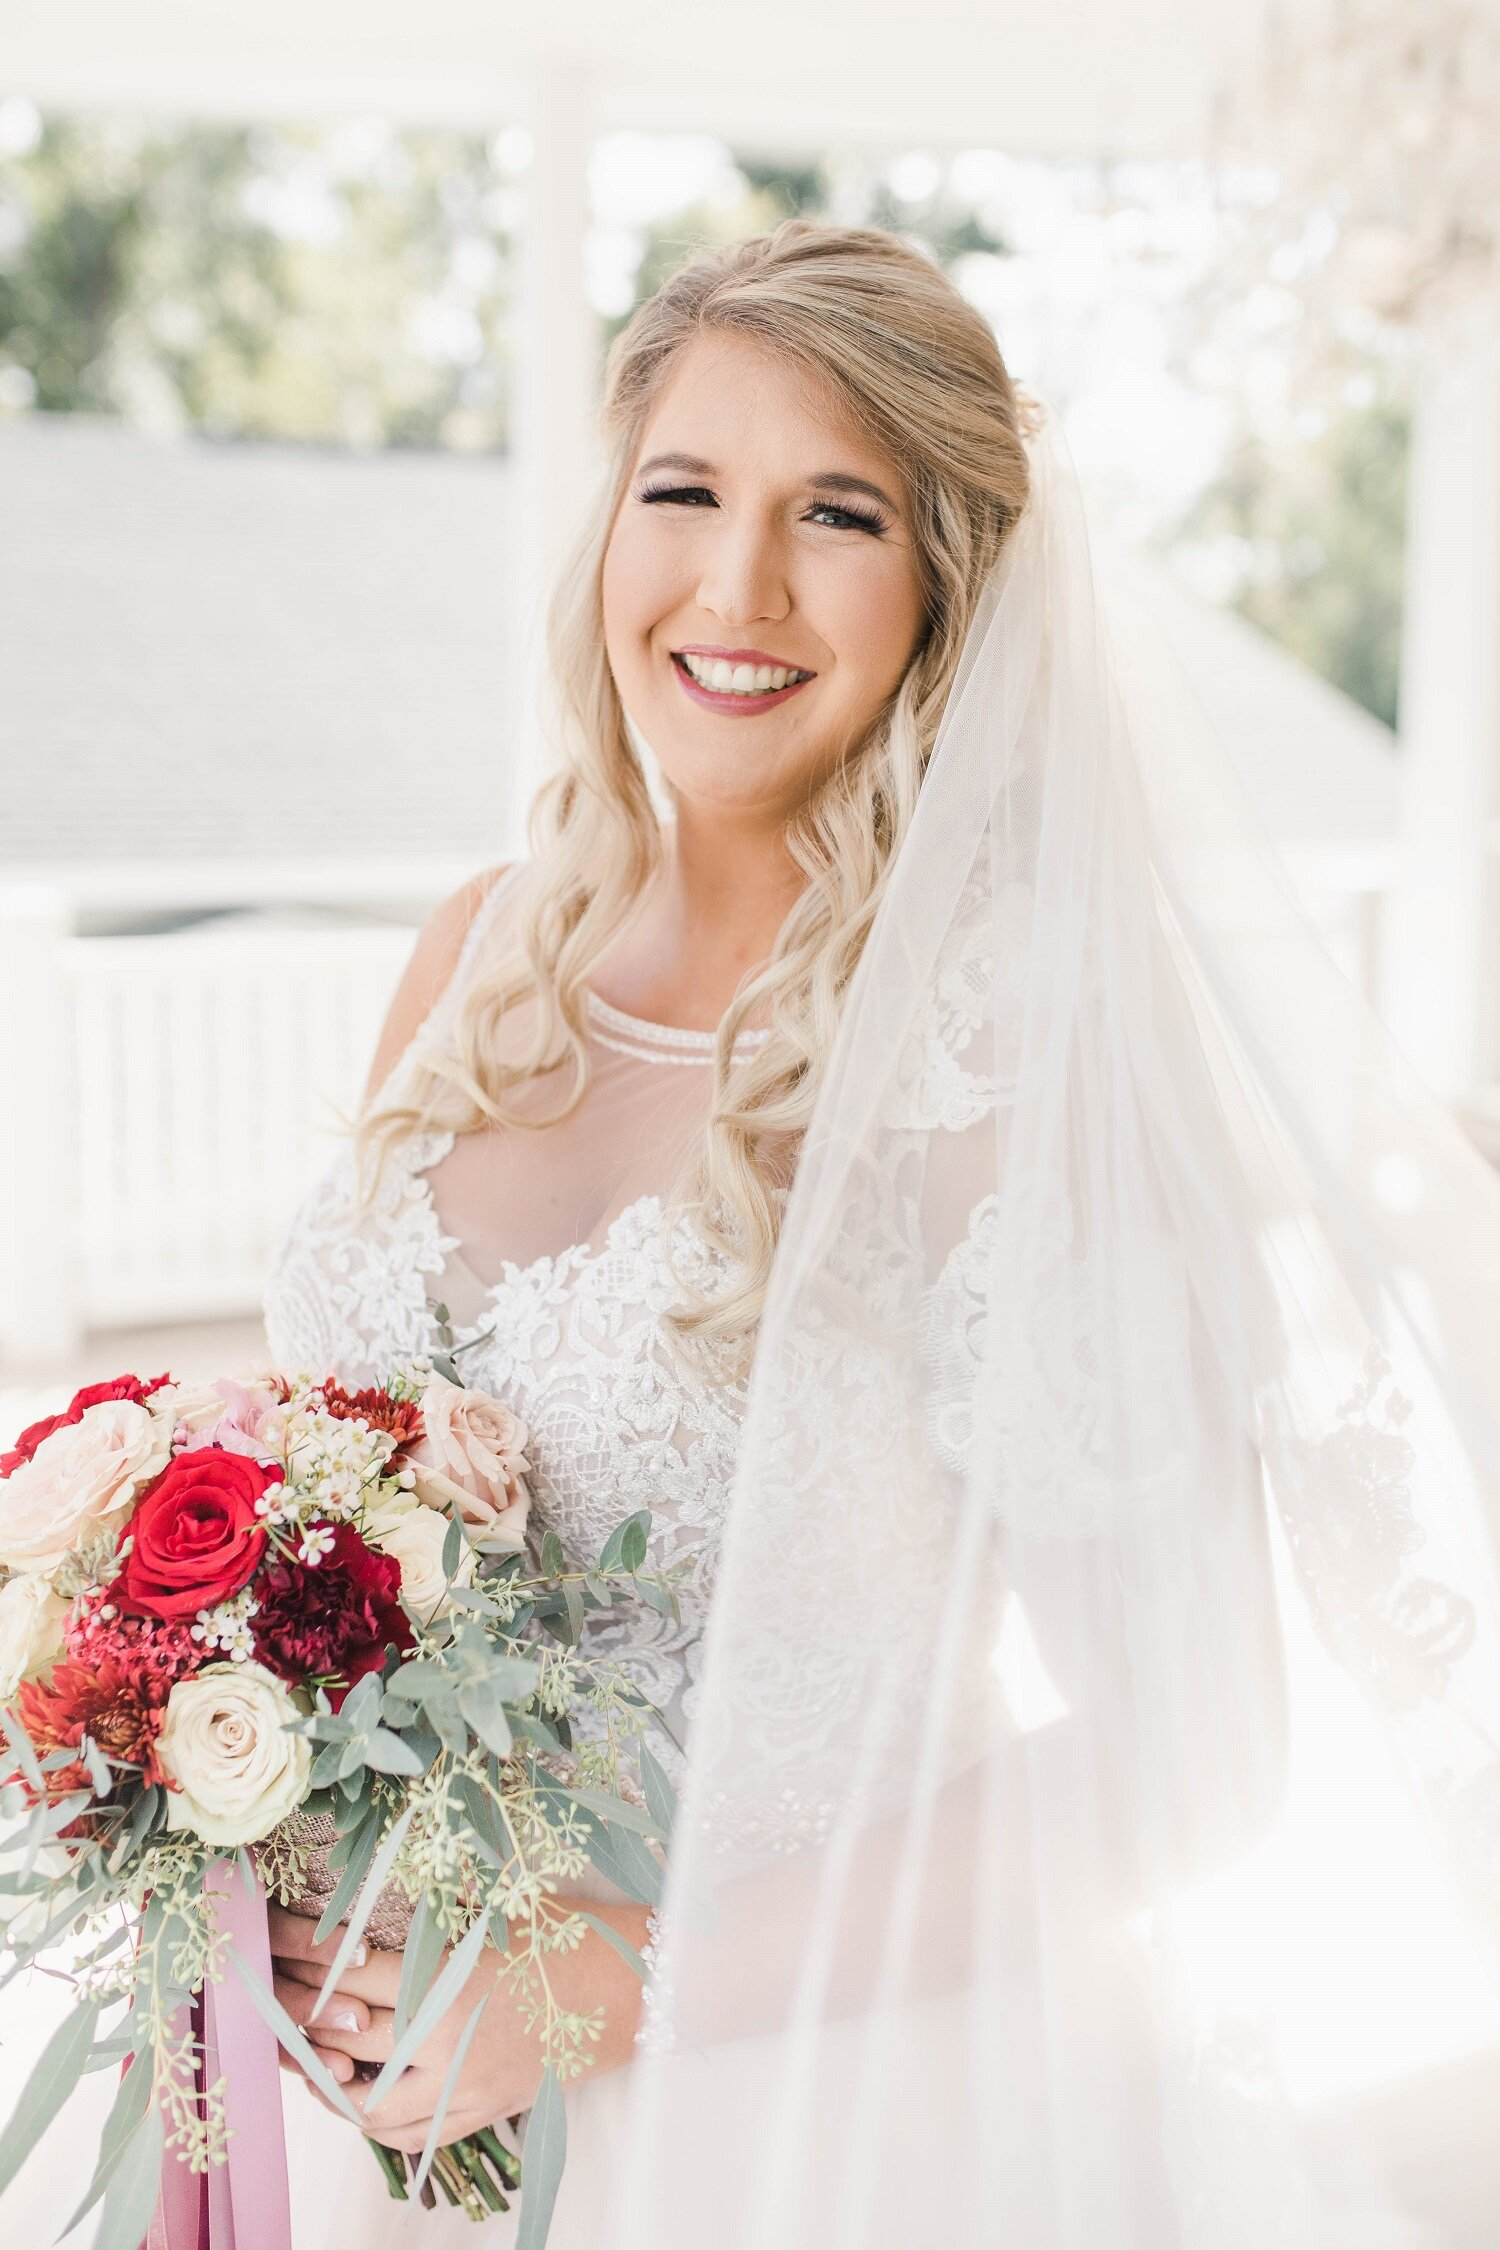 Martino Wedding - Shea's Favorites_-50.jpg